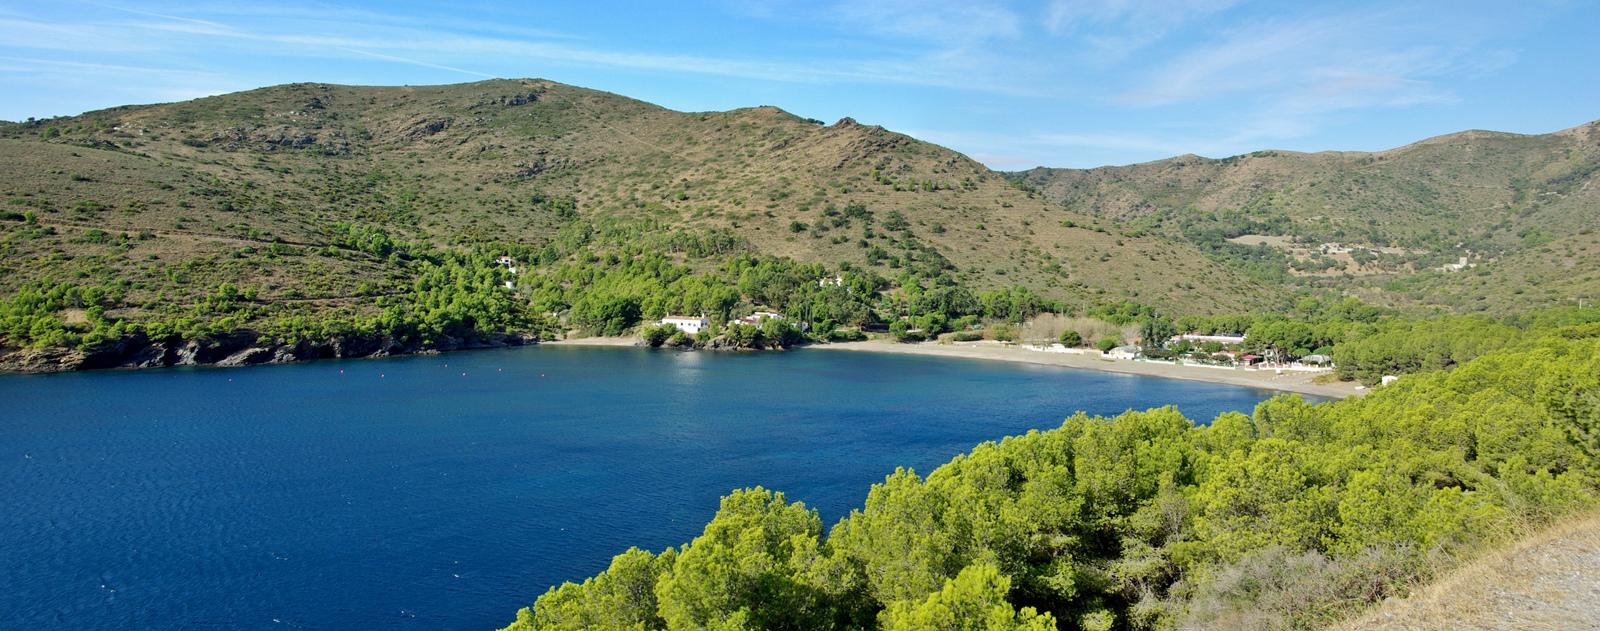 Foto playa Cala Montjoi. Cala Montjoi - El Bulli